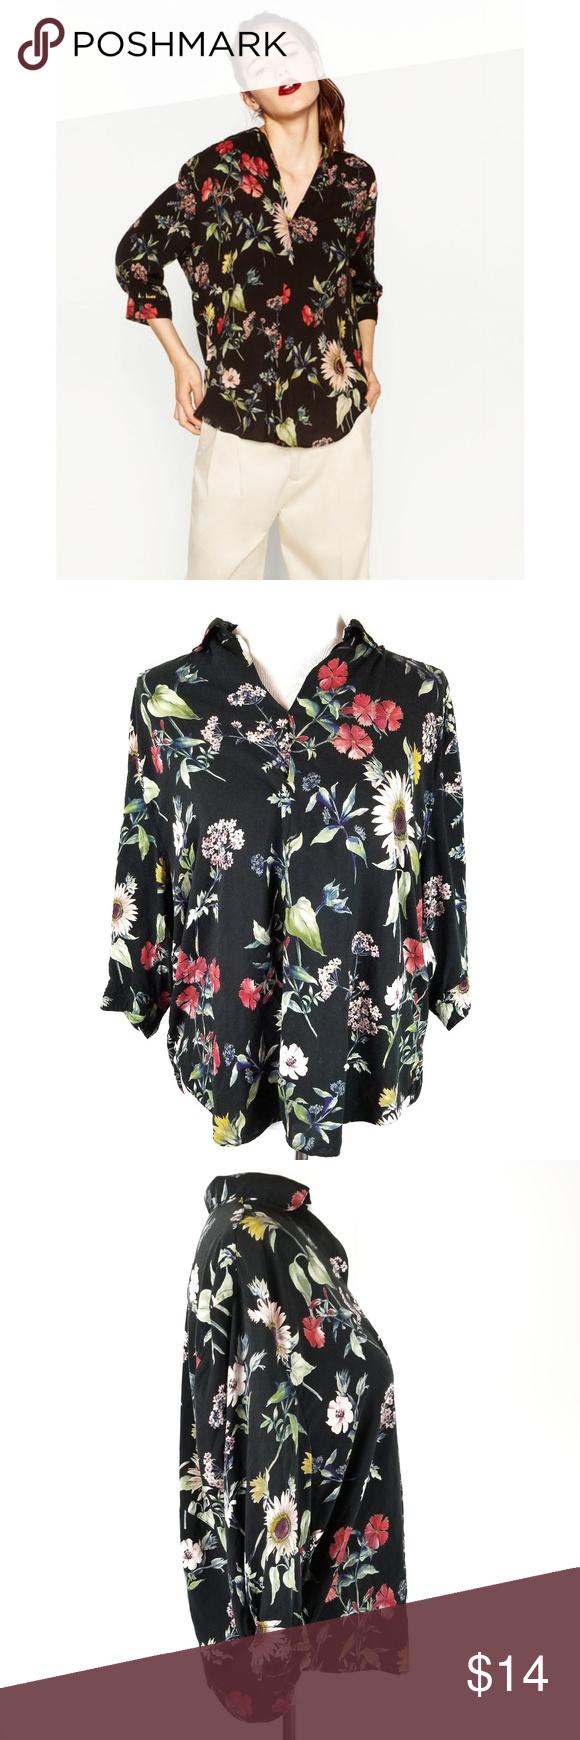 Floral print vintage 80s summer  black blouse Size L